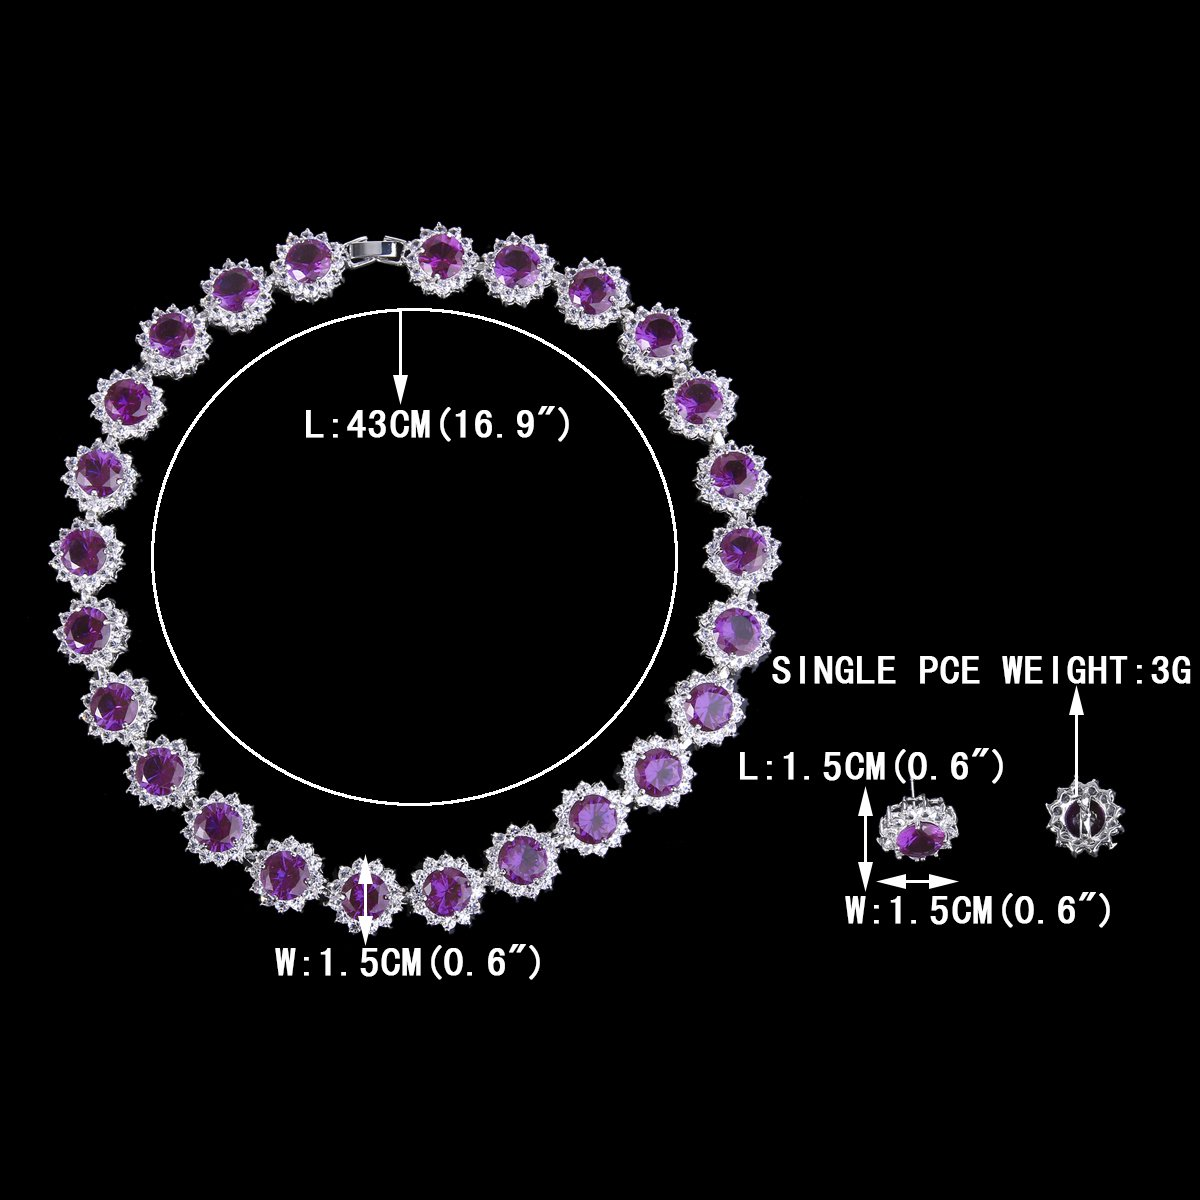 EVER FAITH Crystal Round Cut CZ Elegant Star April Birthstone Necklace Earrings Set Silver-Tone